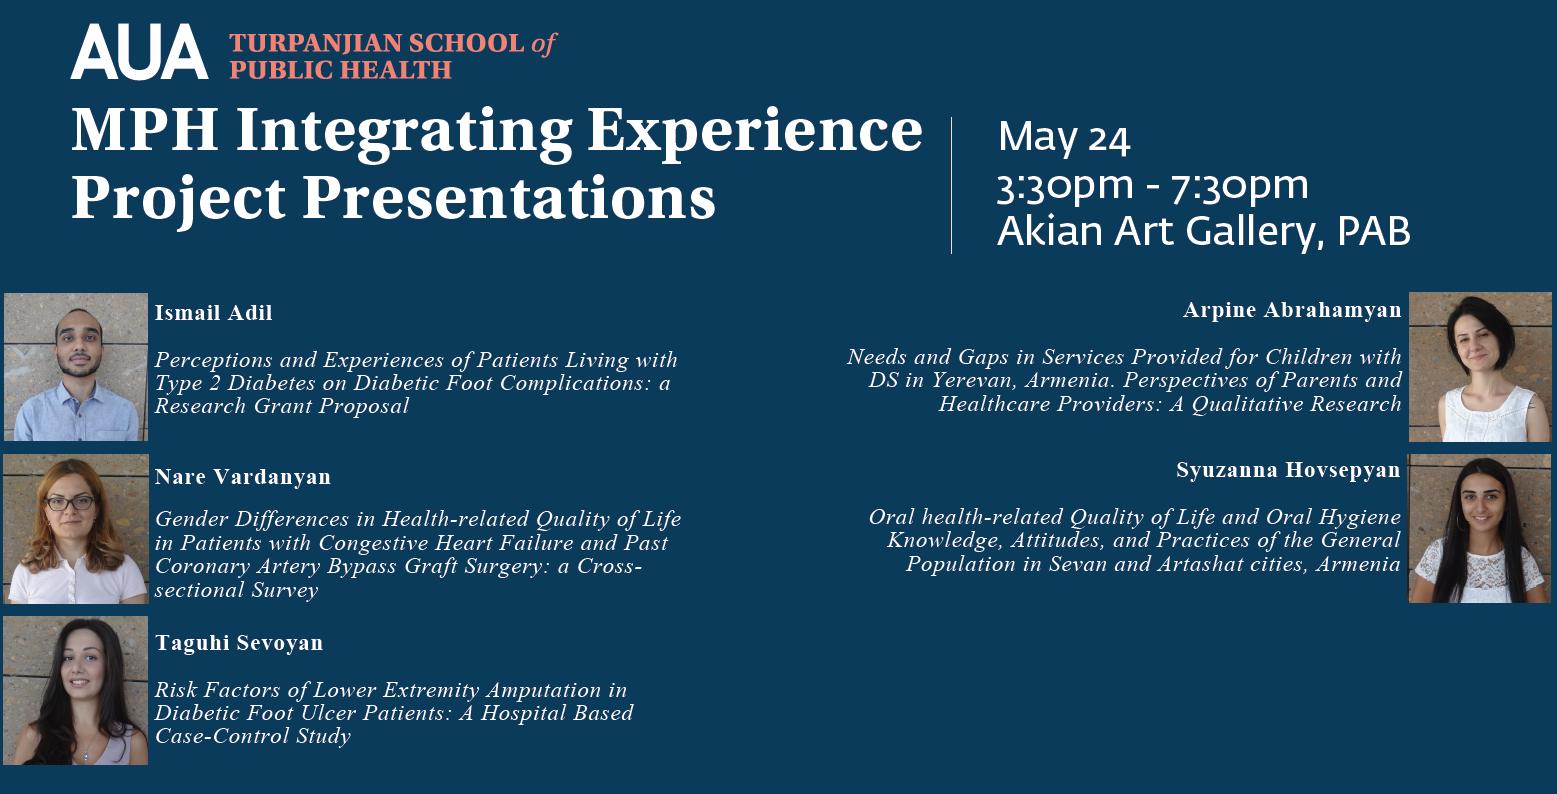 MPH Integrating Experience Project Presentations – AUA Newsroom